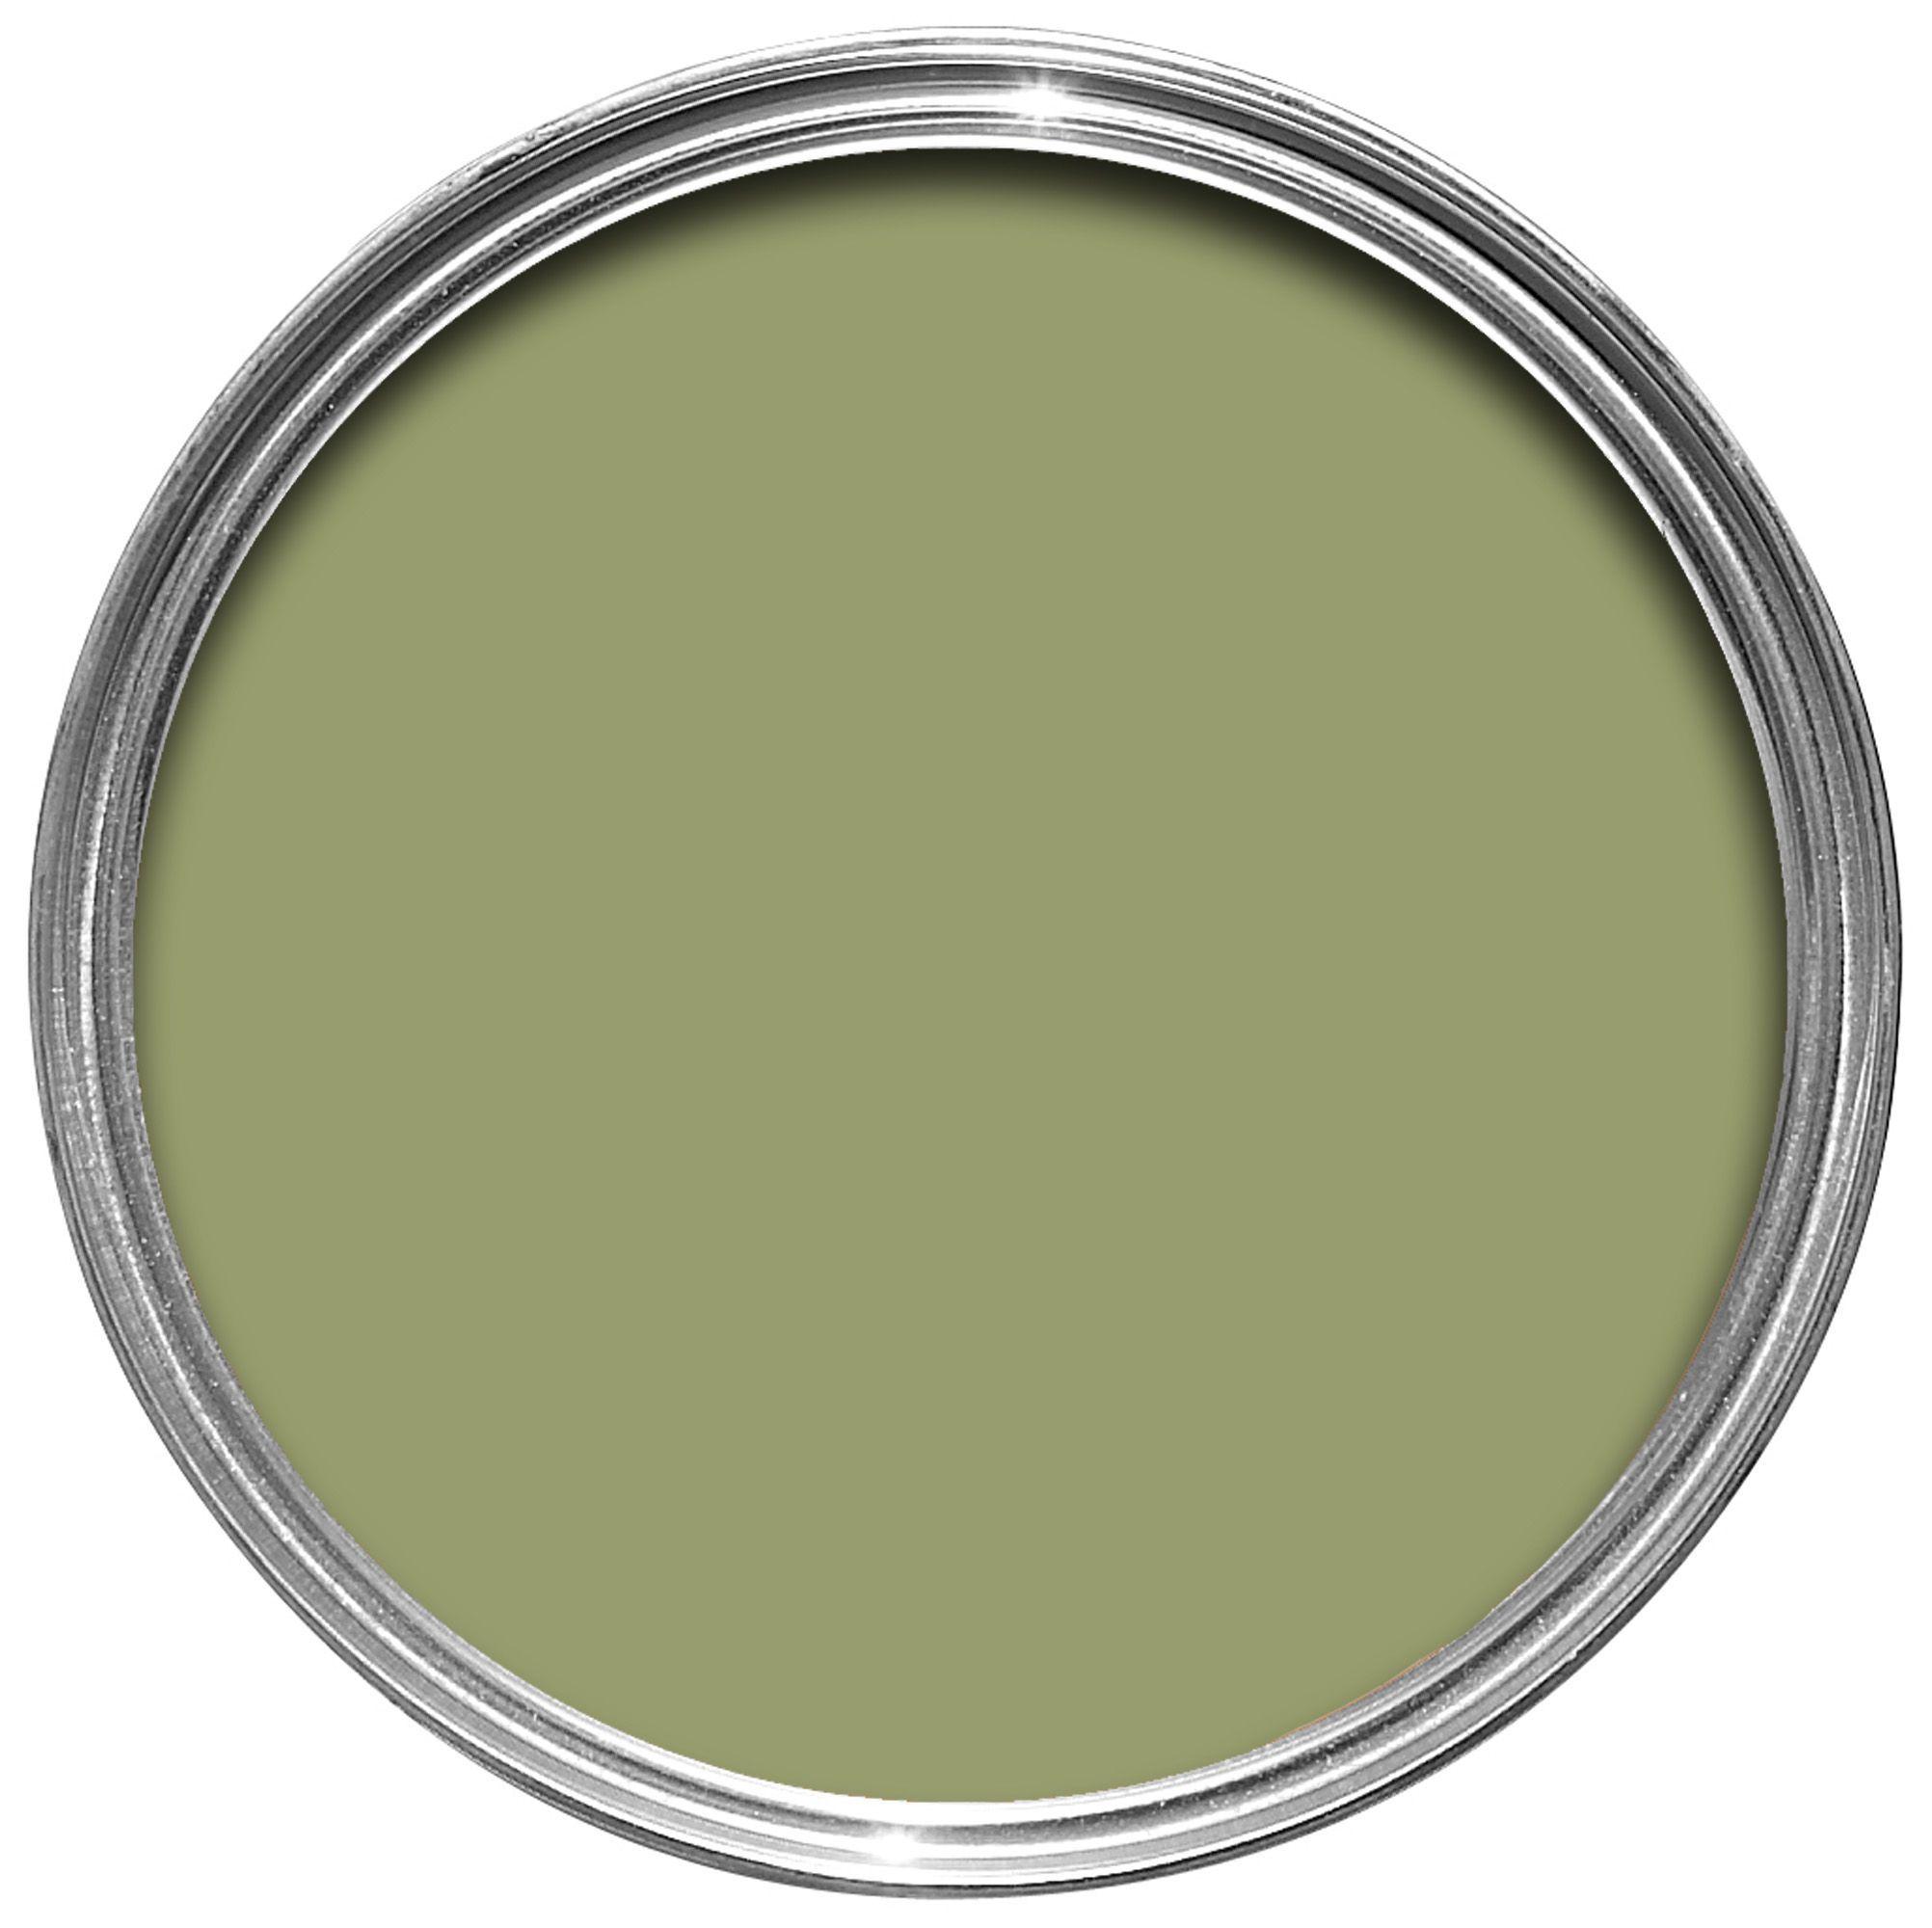 Rust-Oleum Chalky Finish Sage Green Matt Furniture Paint